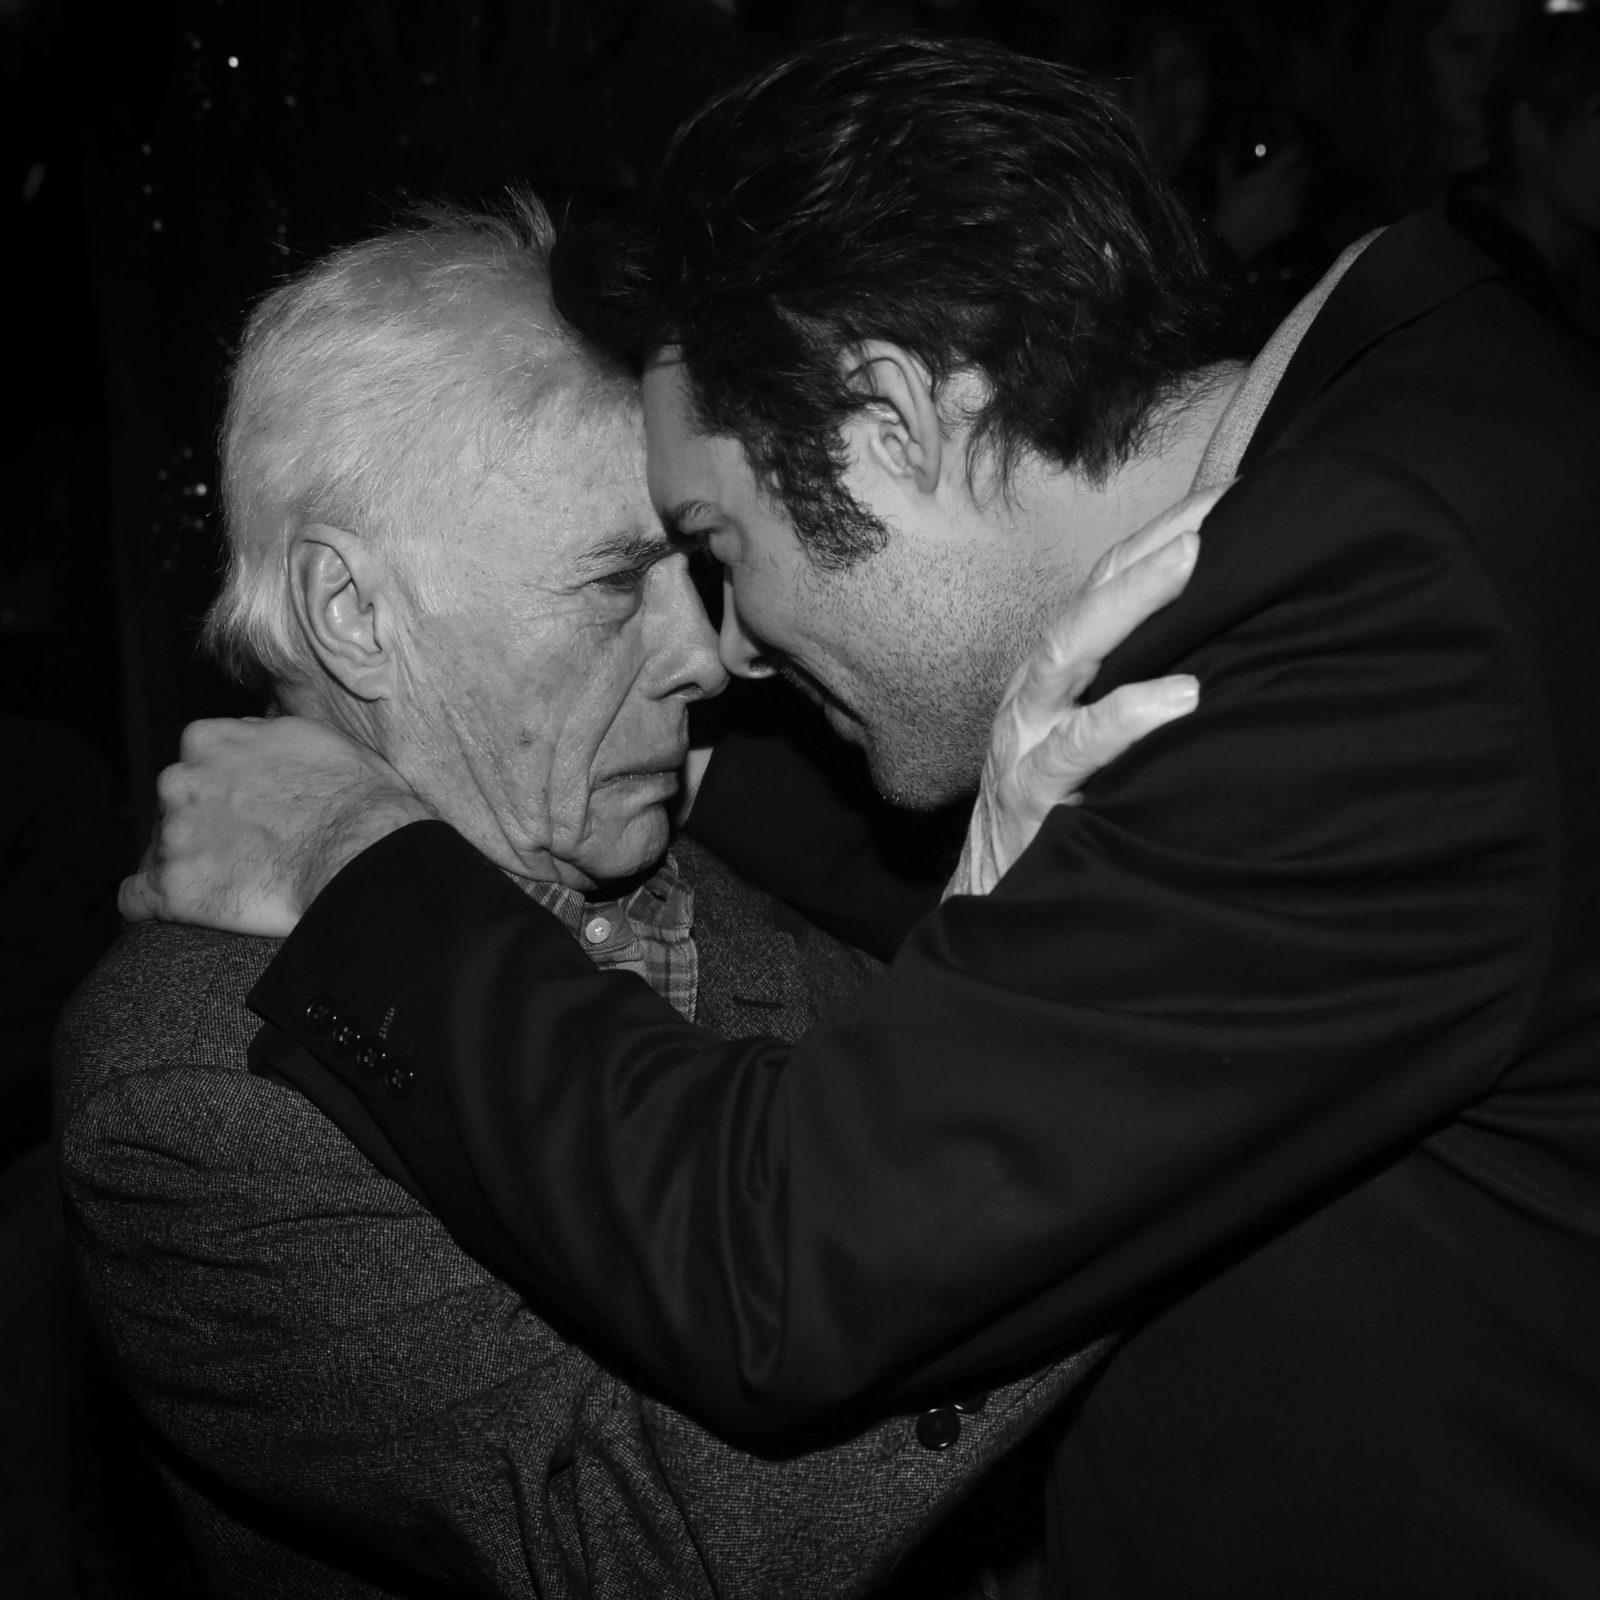 Guy Bedos et son fils Nicolas Bedos